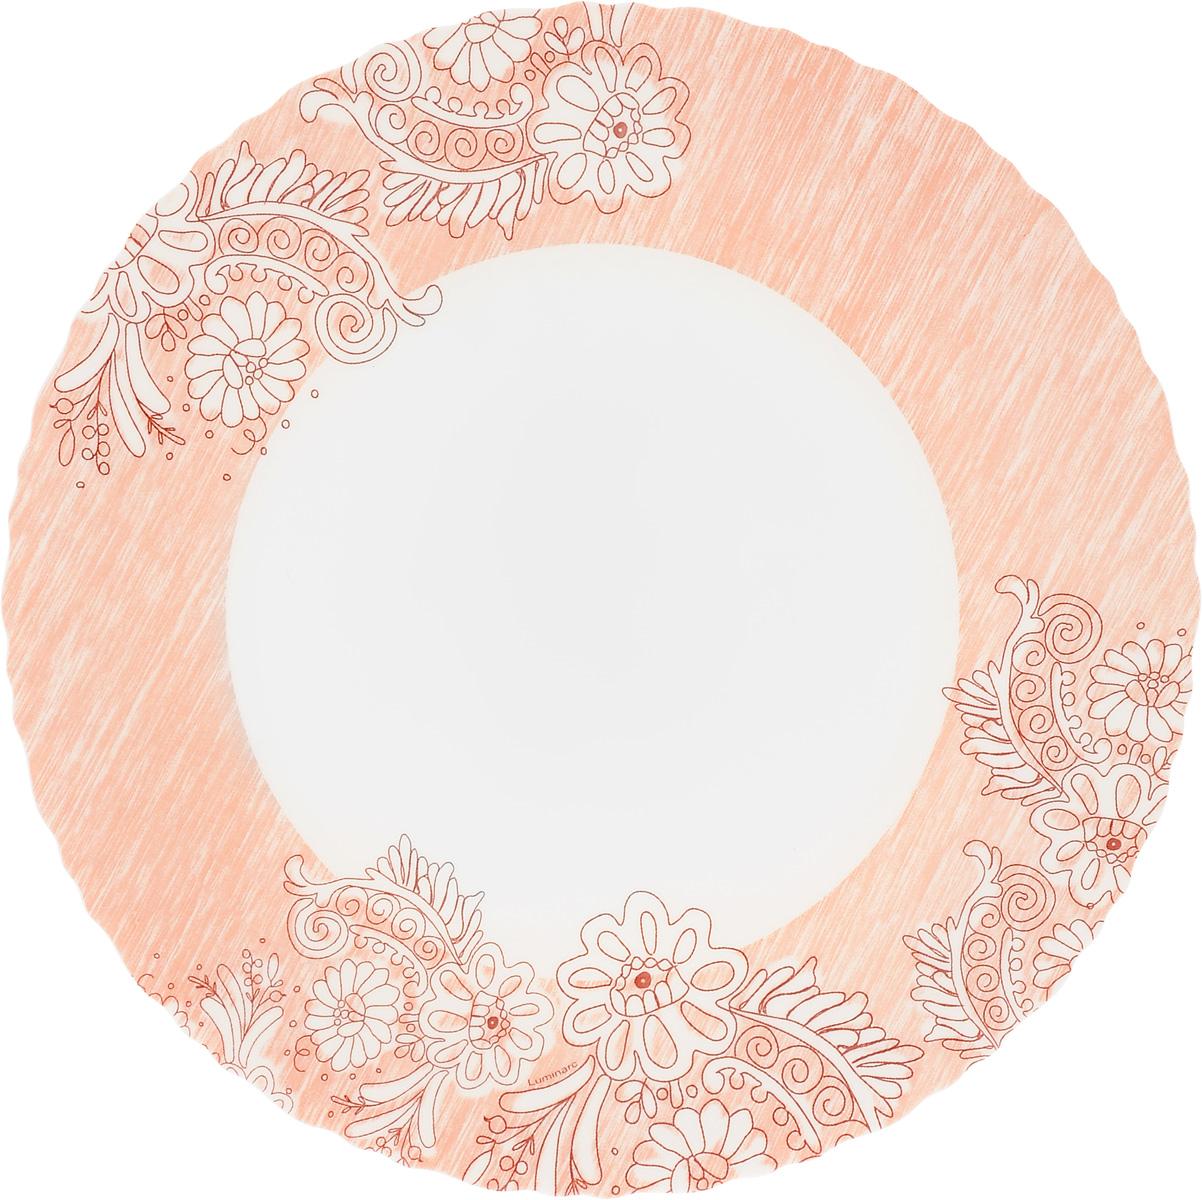 Тарелка обеденная Luminarc Minelly Pink, диаметр 25 см тарелка обеденная luminarc sofiane blue 25 25 см page 3